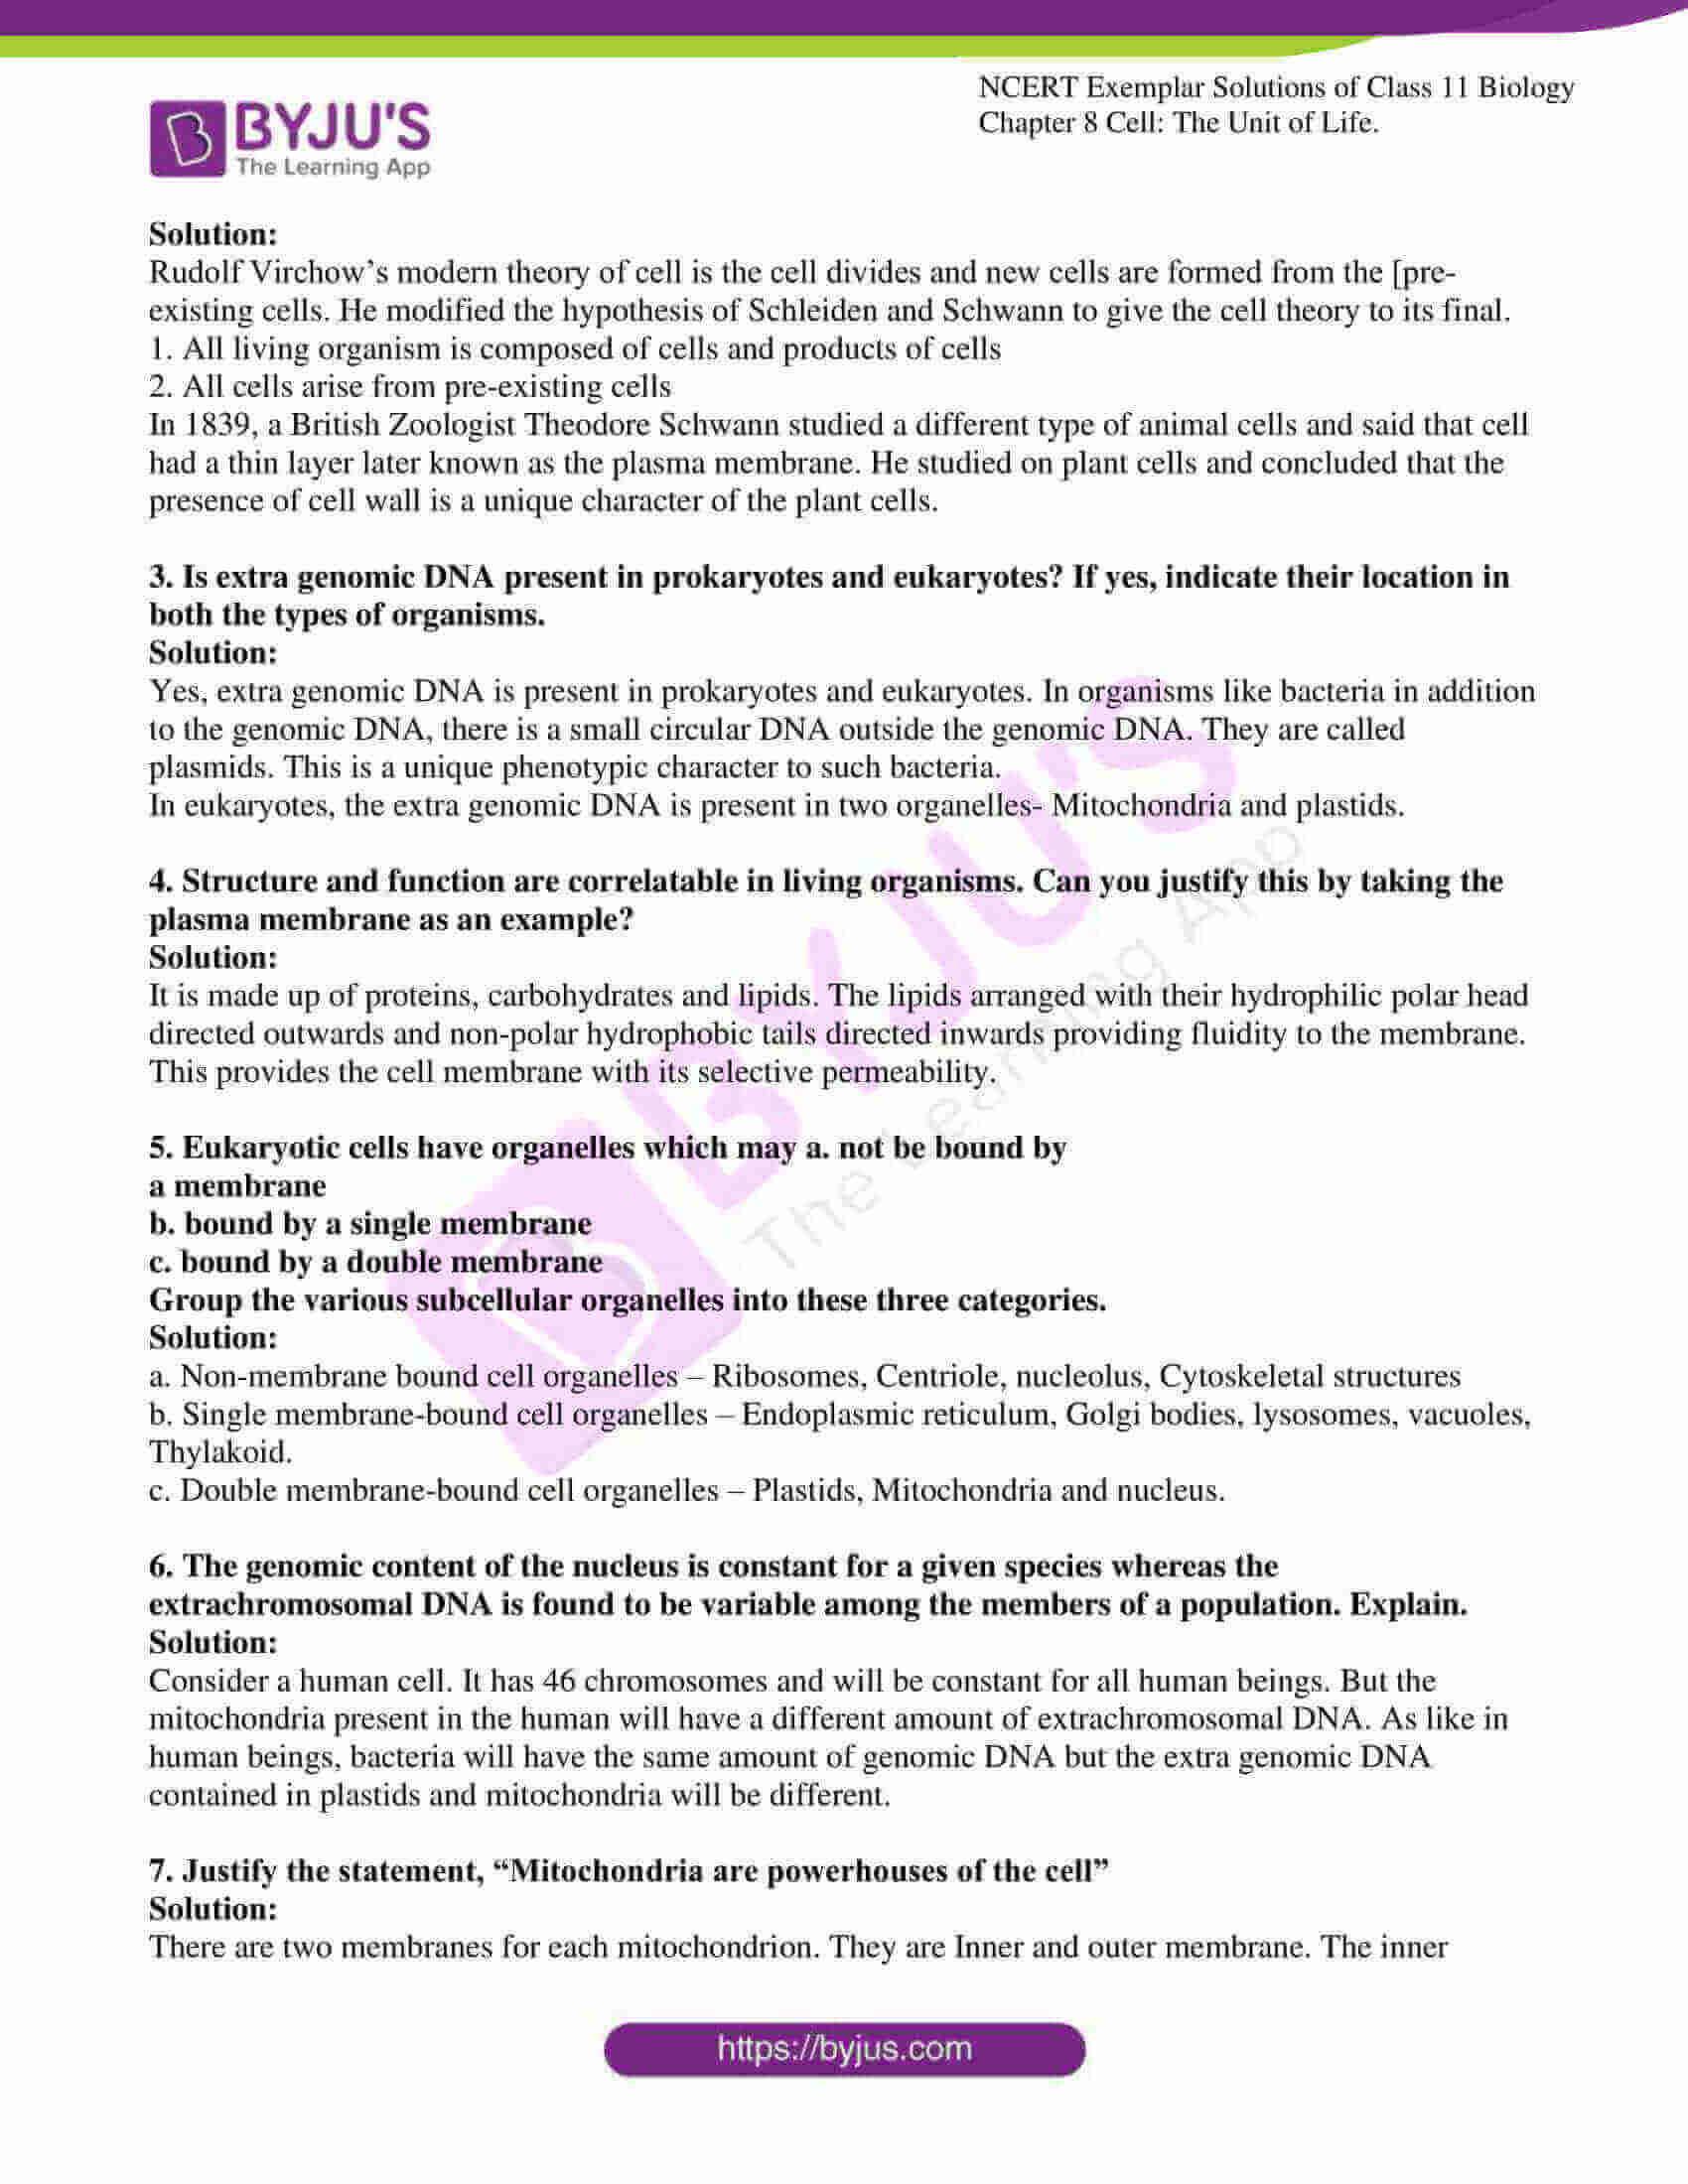 ncert exemplar solutions for class 11 bio chapter 8 6